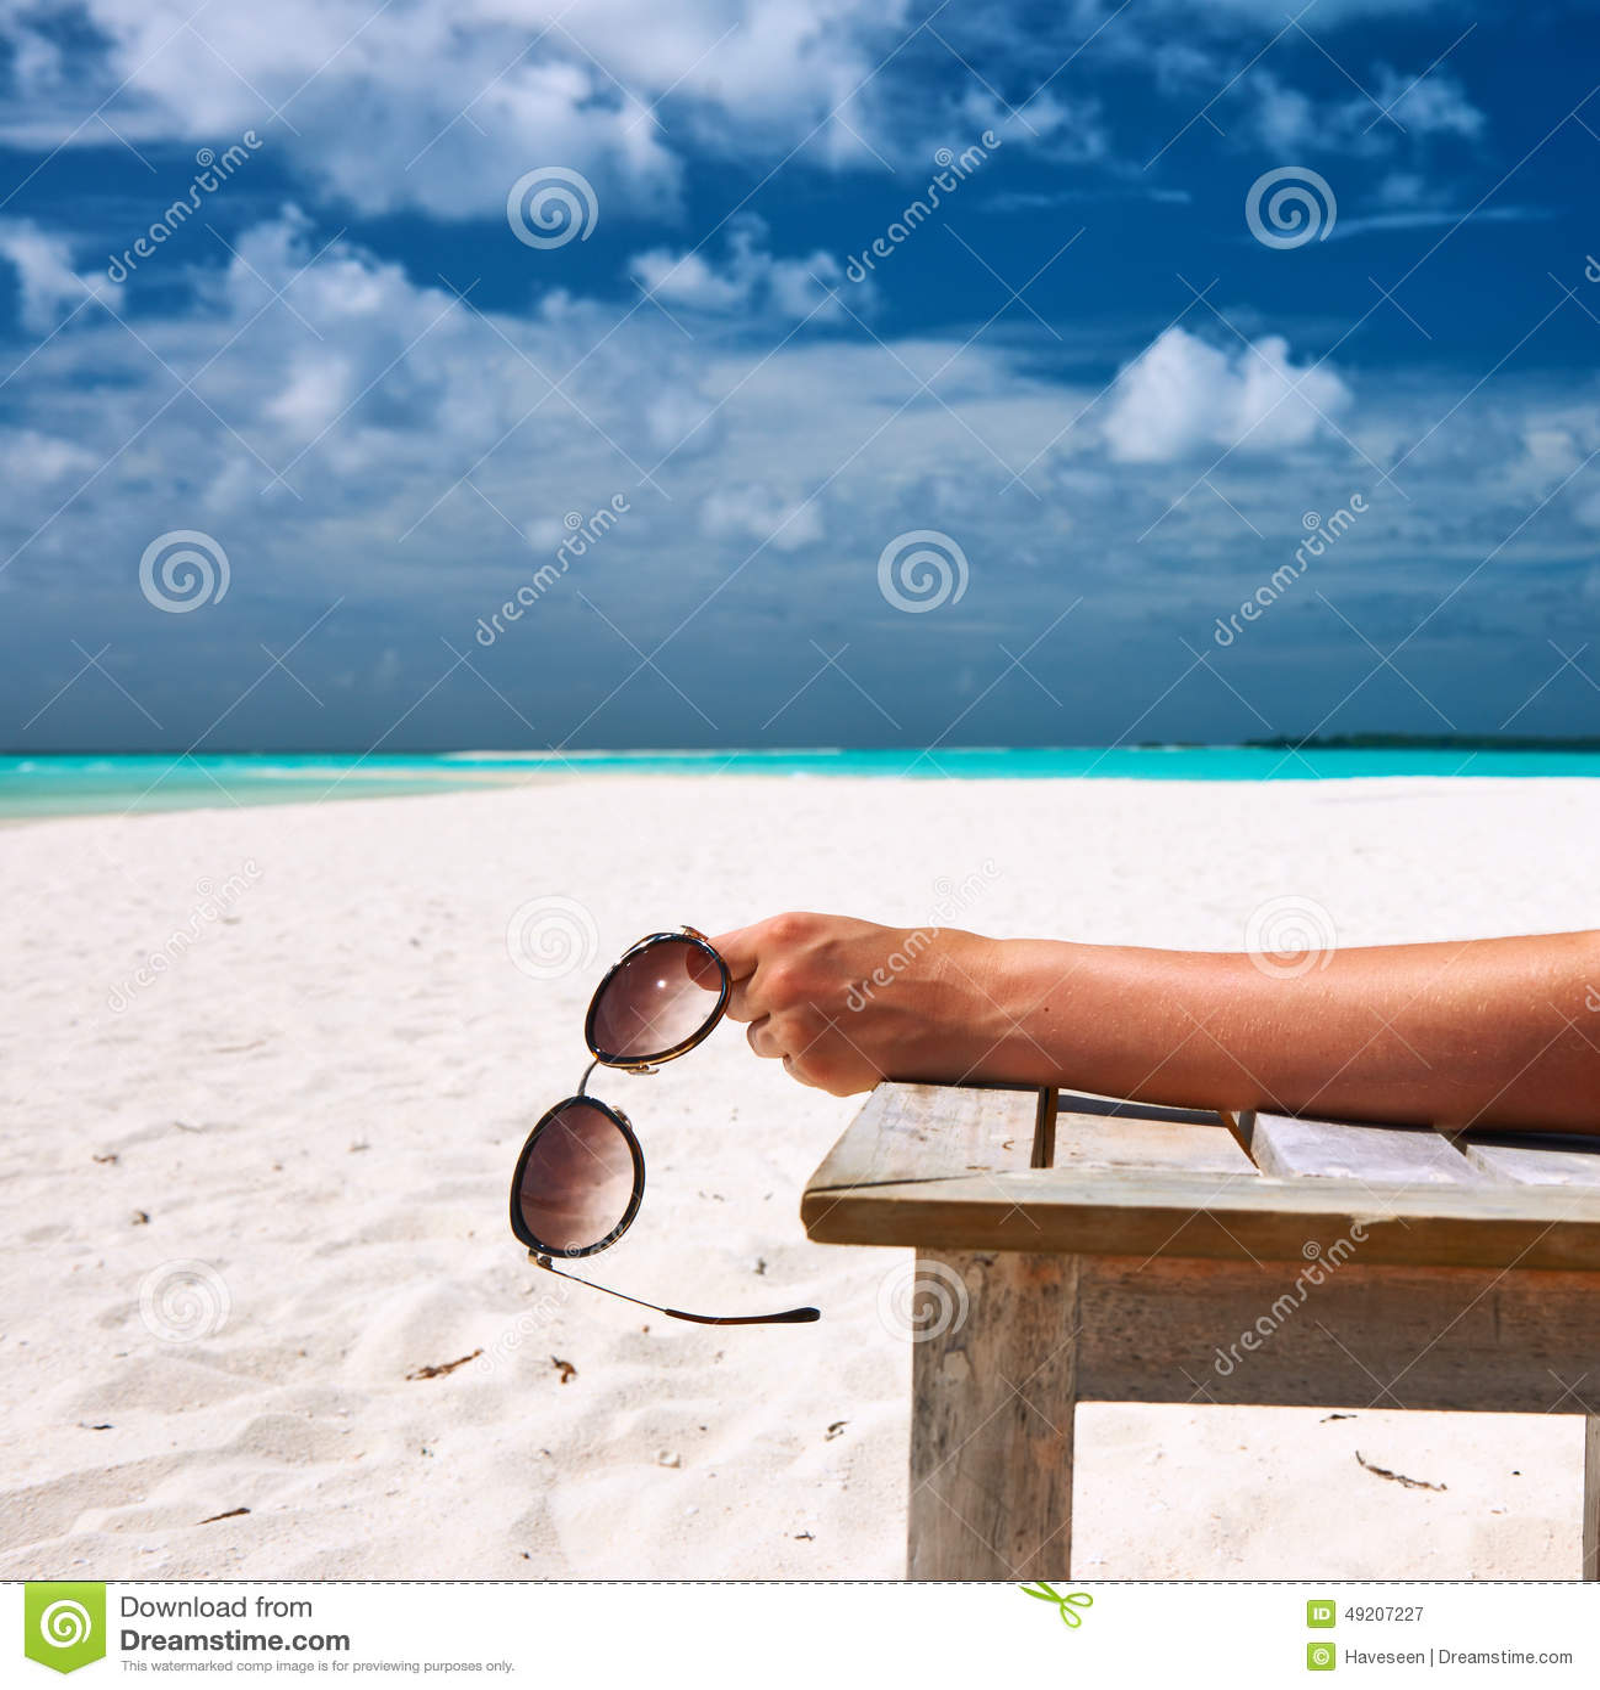 Woman At Beach Holding Sunglasses Stock Image